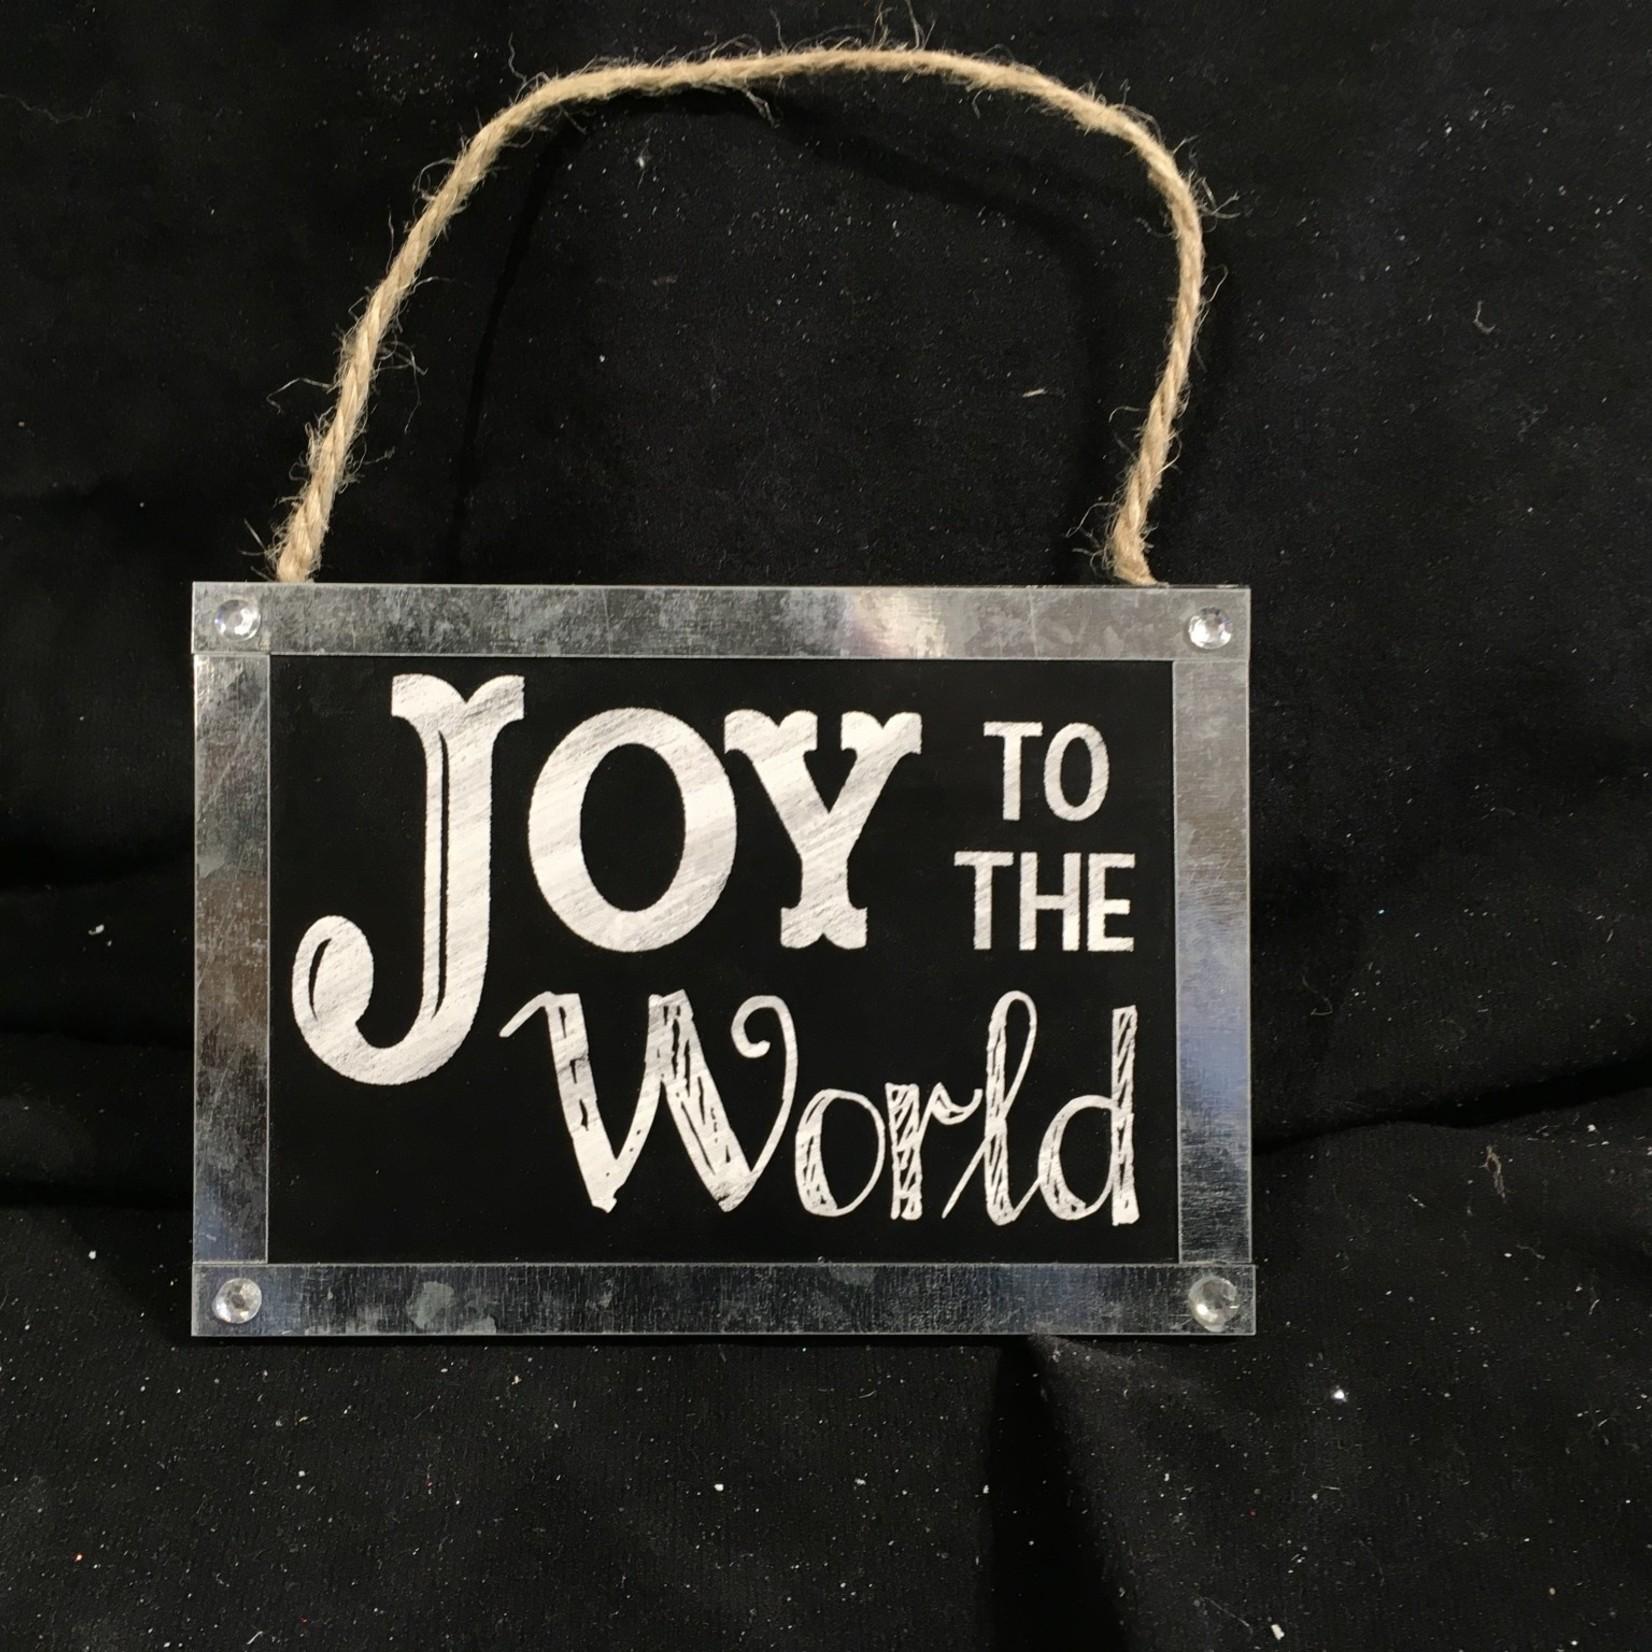 "**5.75x4"" Chalkboard Joy To The World Plaque"